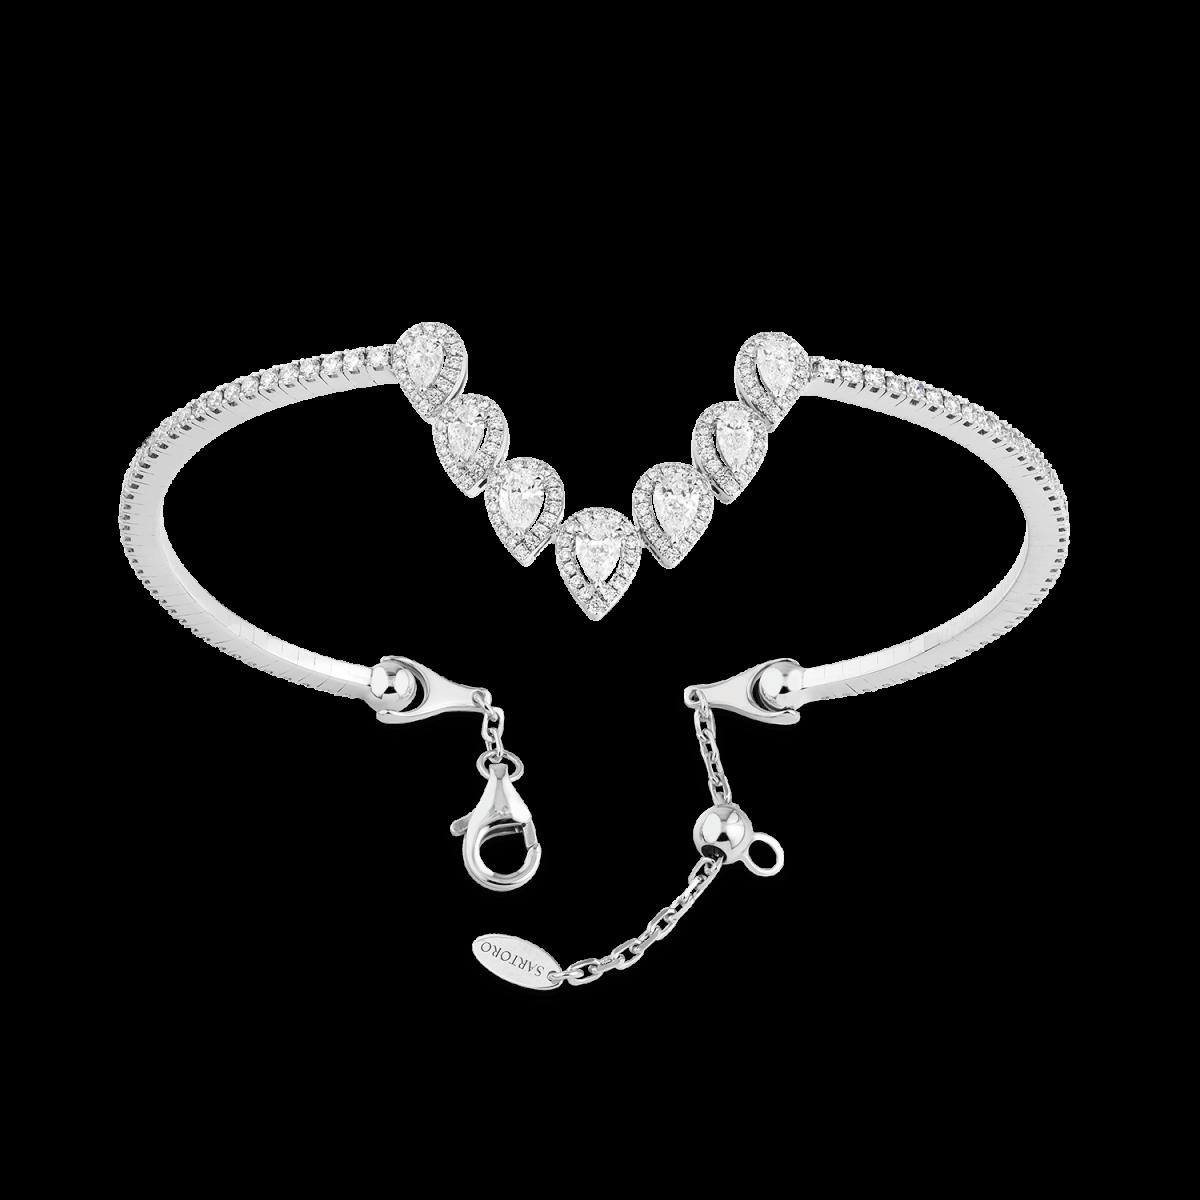 Ariana white gold bangle with diamonds